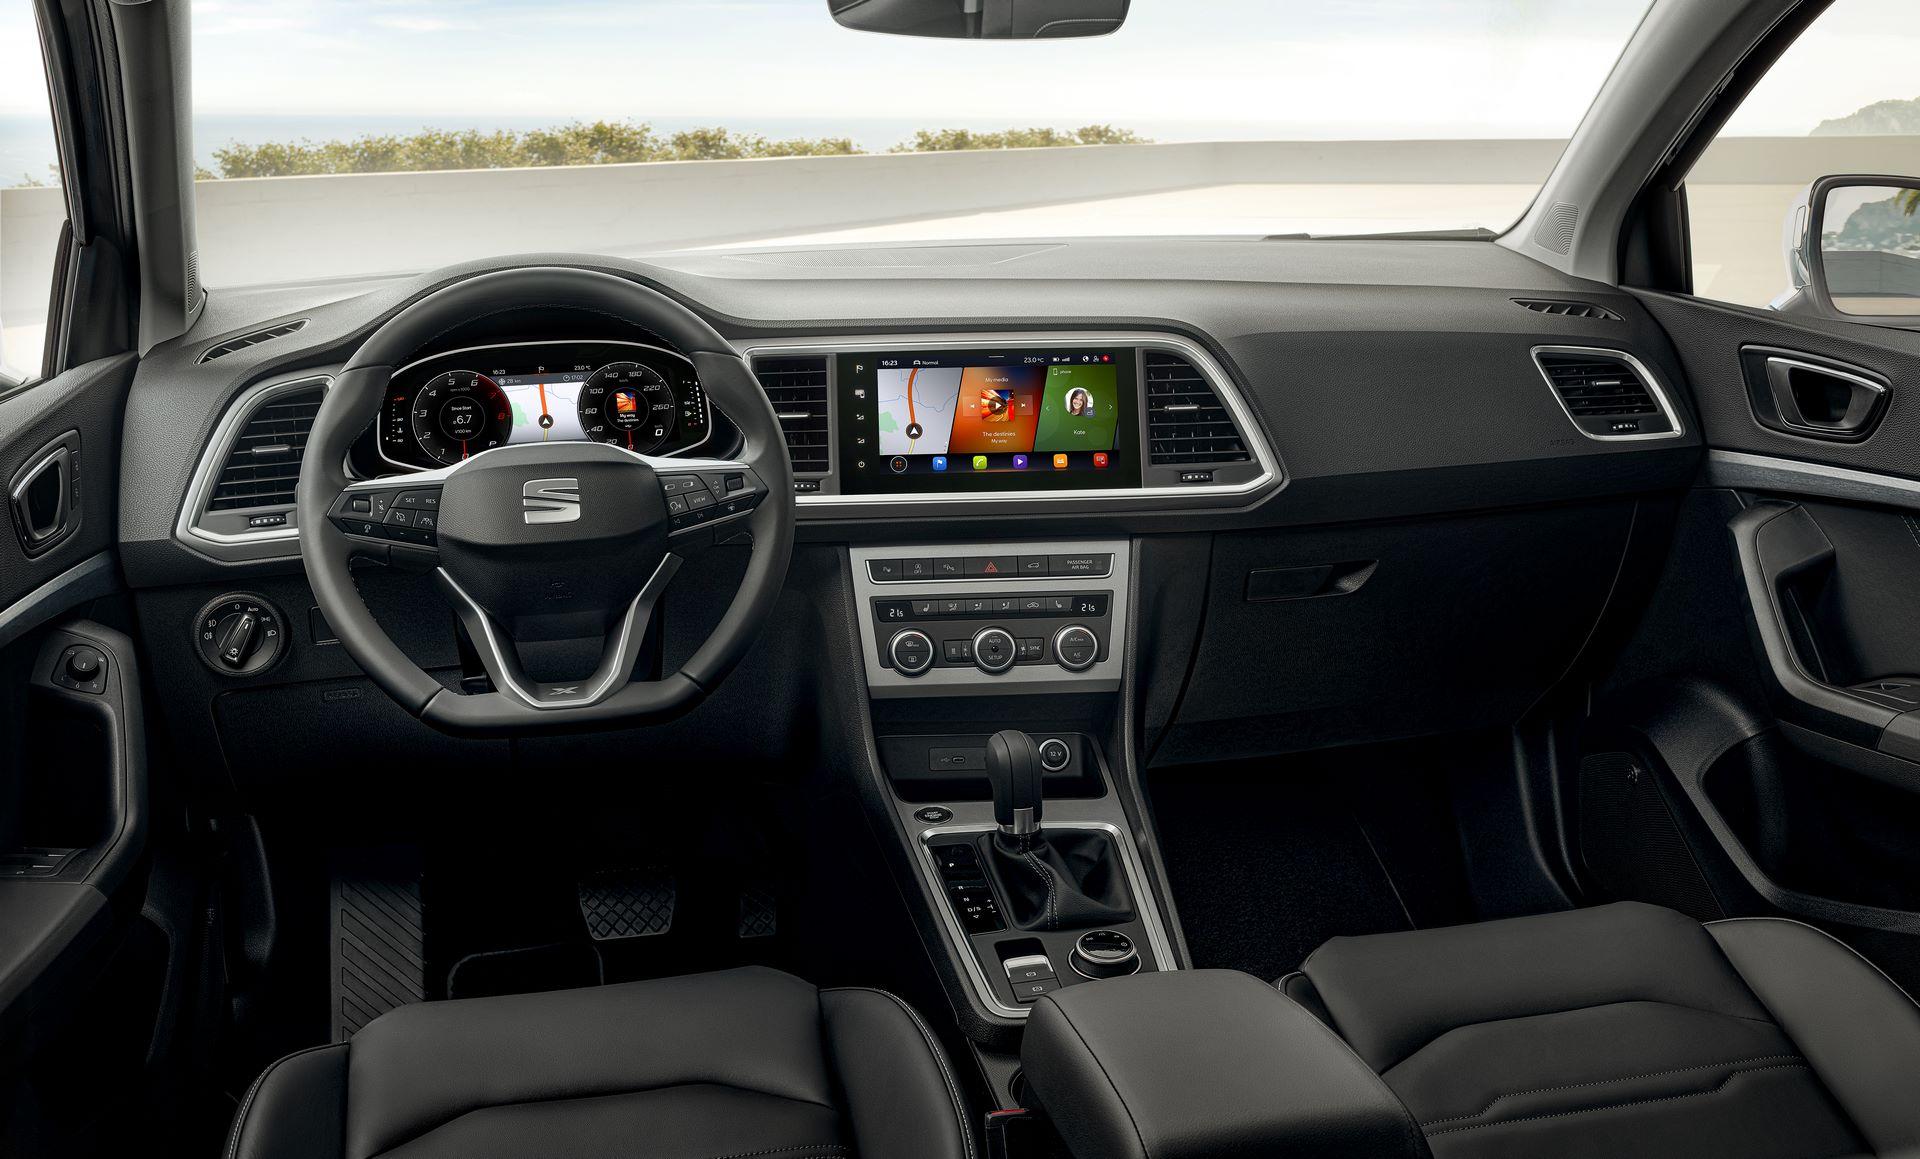 Seat-Ateca-facelift-2020-12